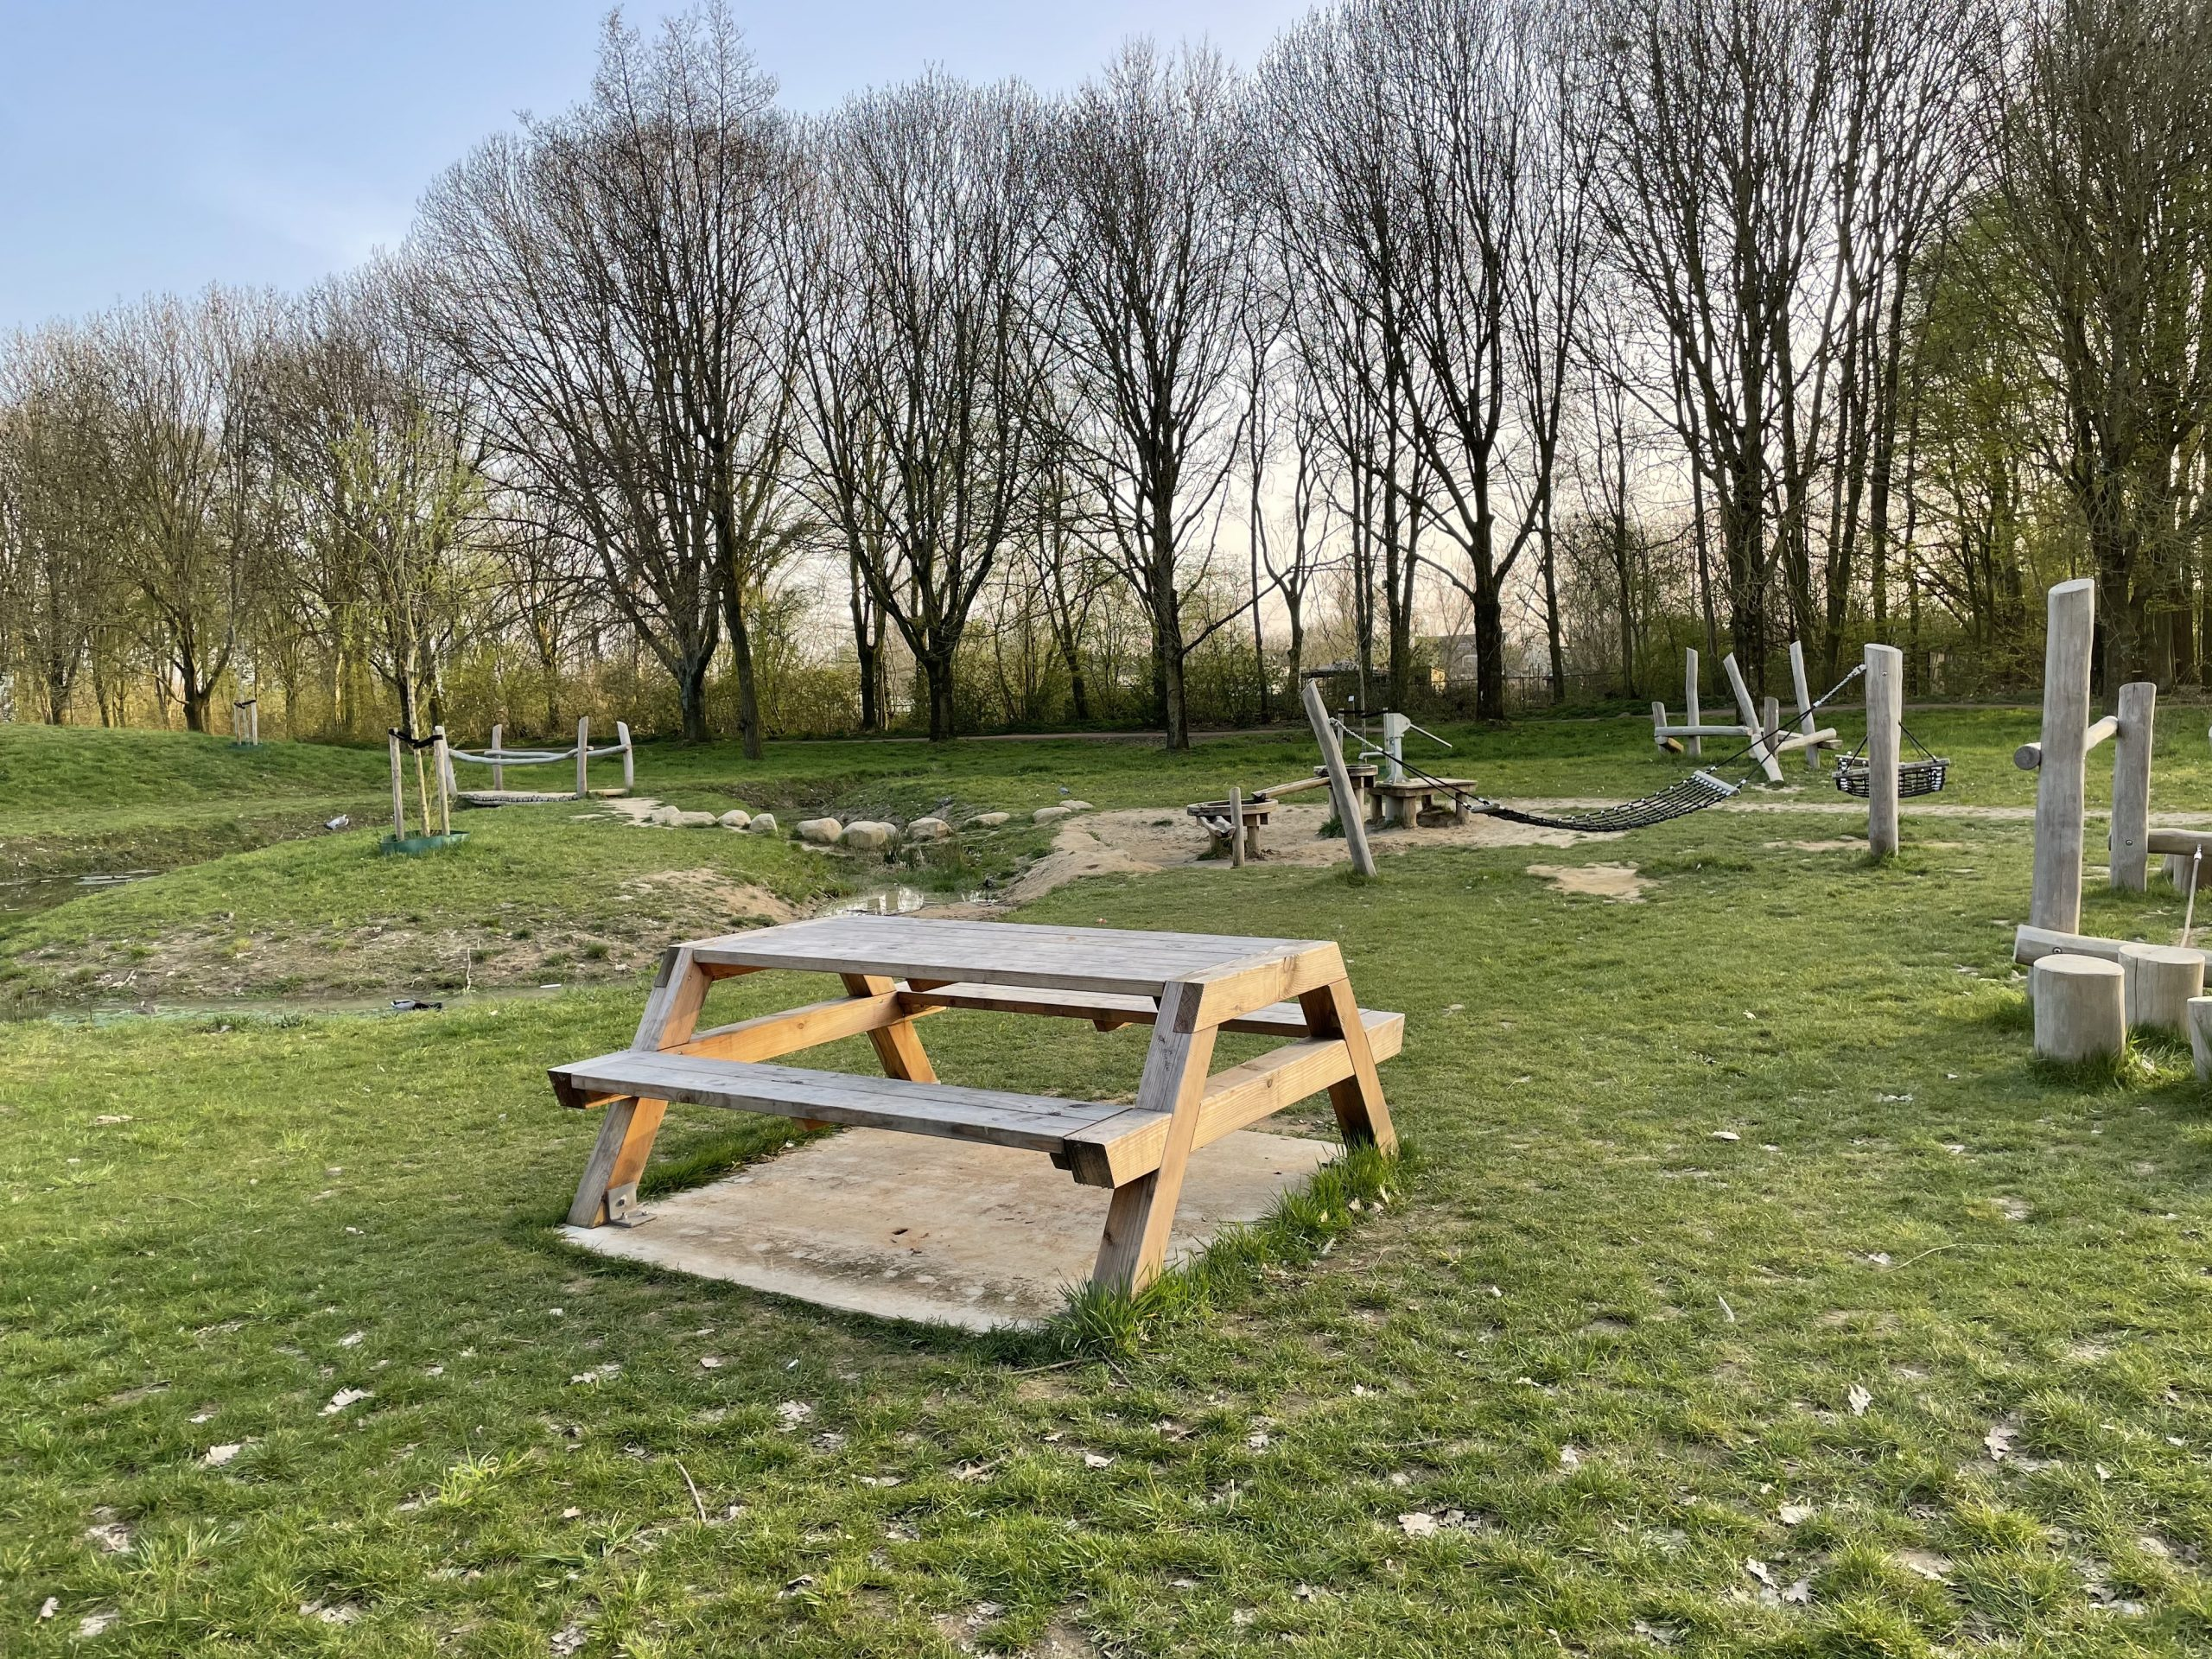 Picknicken bij de waterspeeltuin Oosterpark Wijchen - Wijchen=